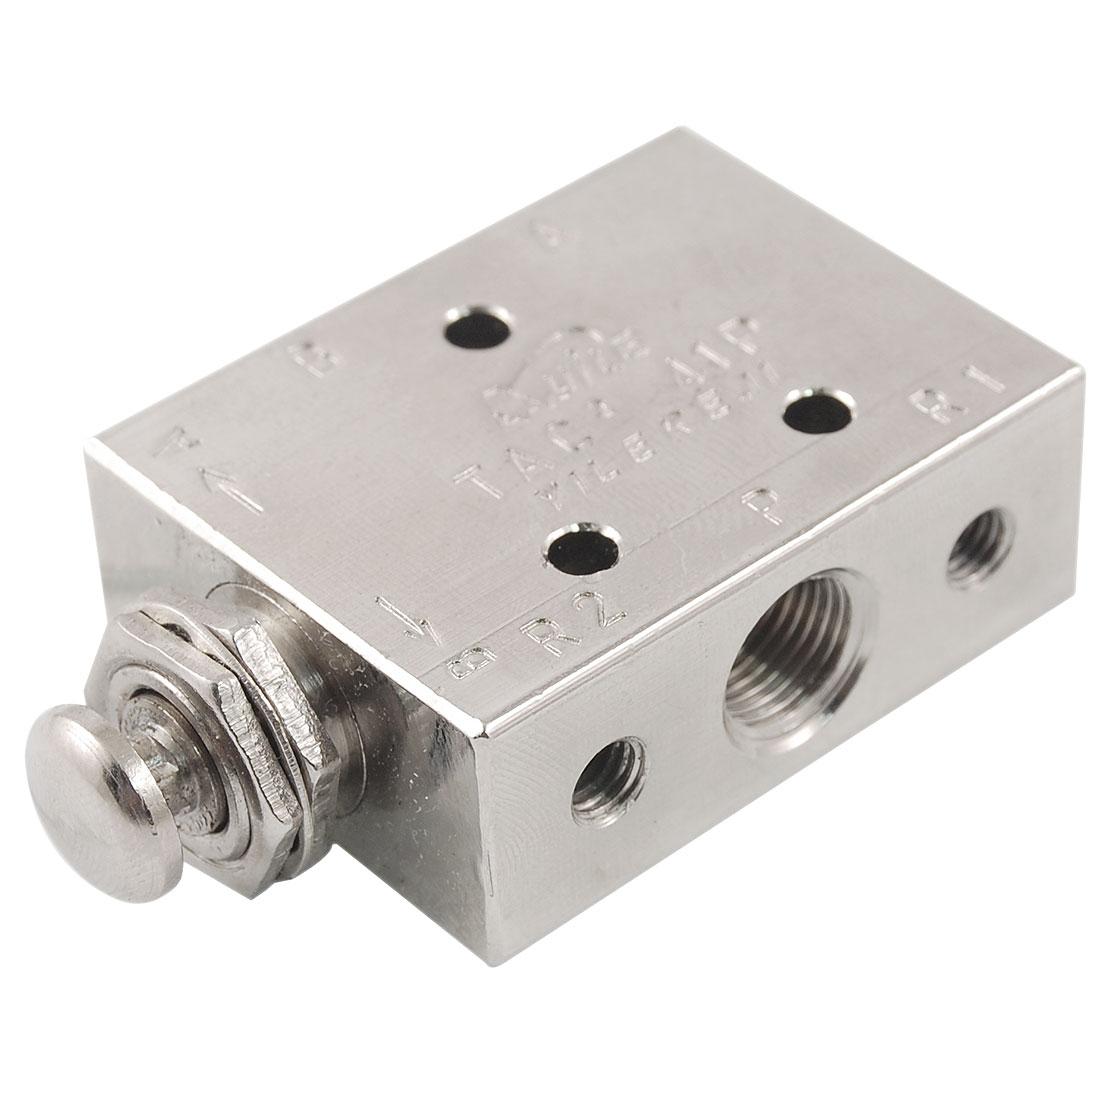 Pneumatic 2 Position 3 Way Spring Return Push Button Air Valve TAC2-41P